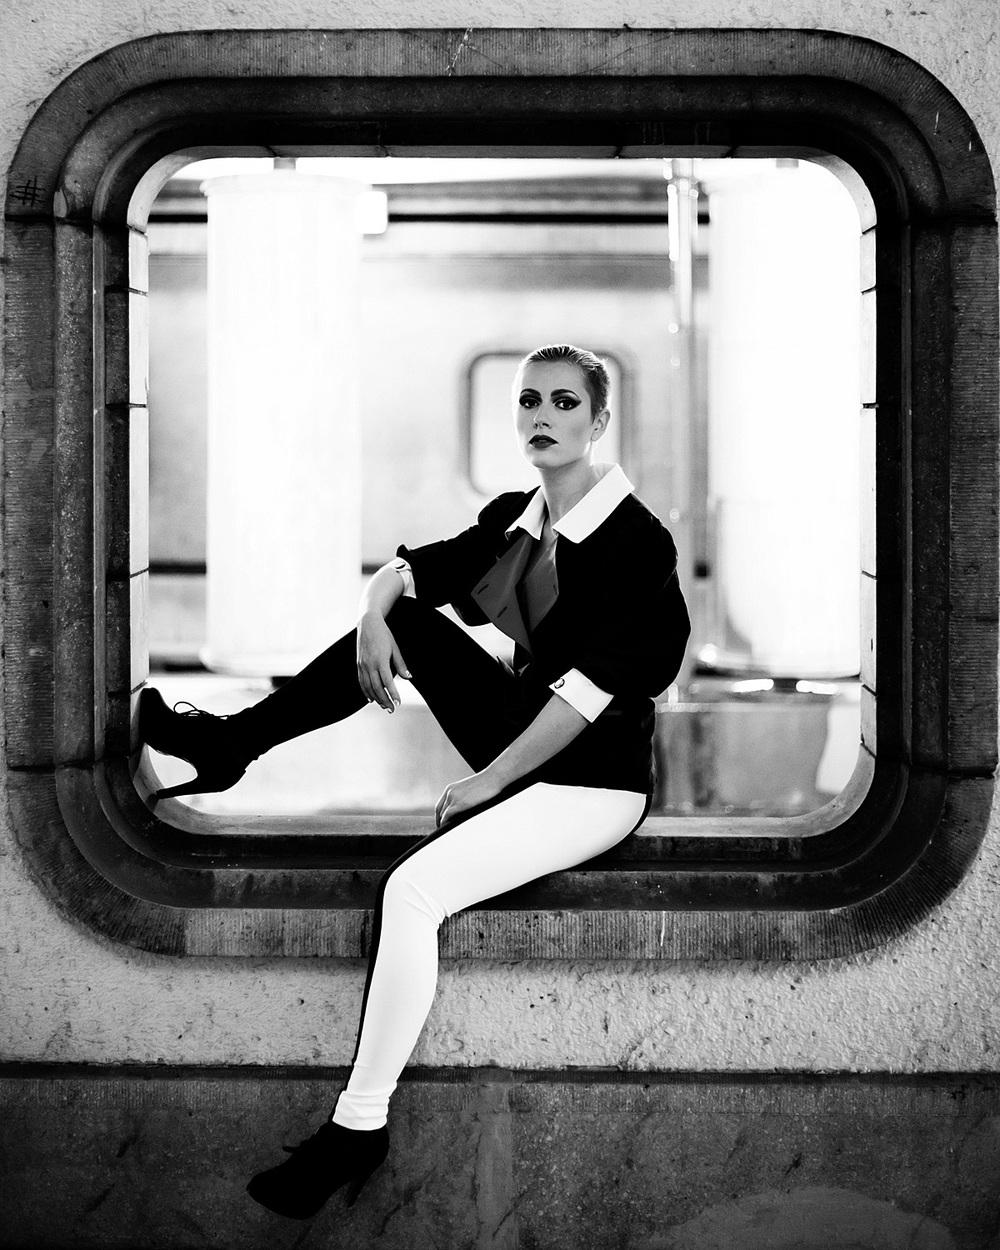 Modefotografie portret vintage zwart-wit viaduct brug Eindhoven